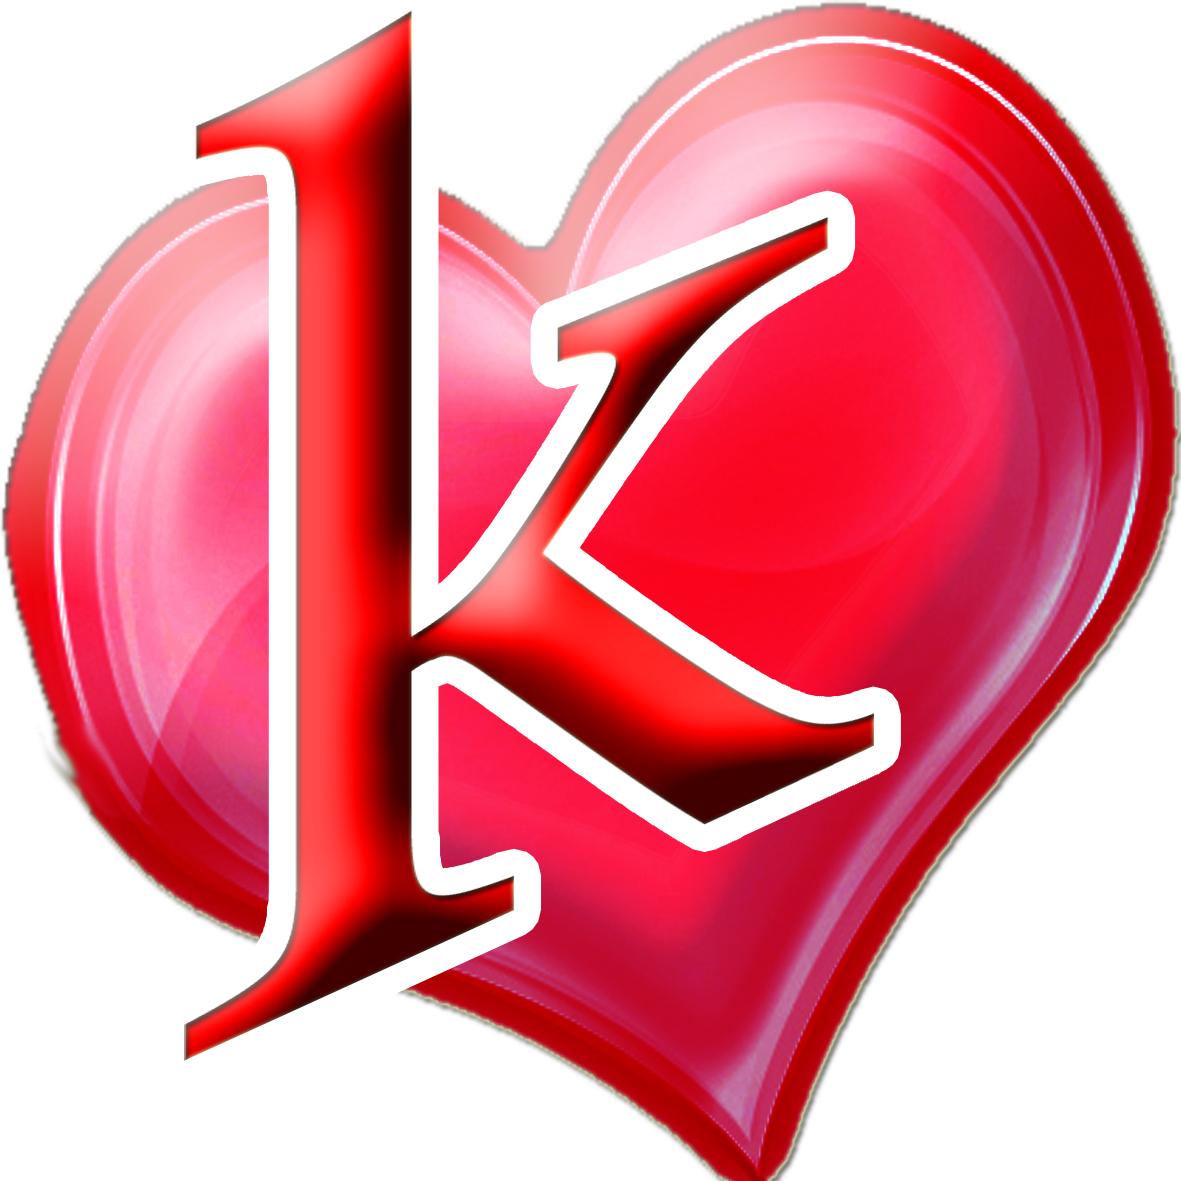 صور صور حرف k , اجمل الصور حرف k